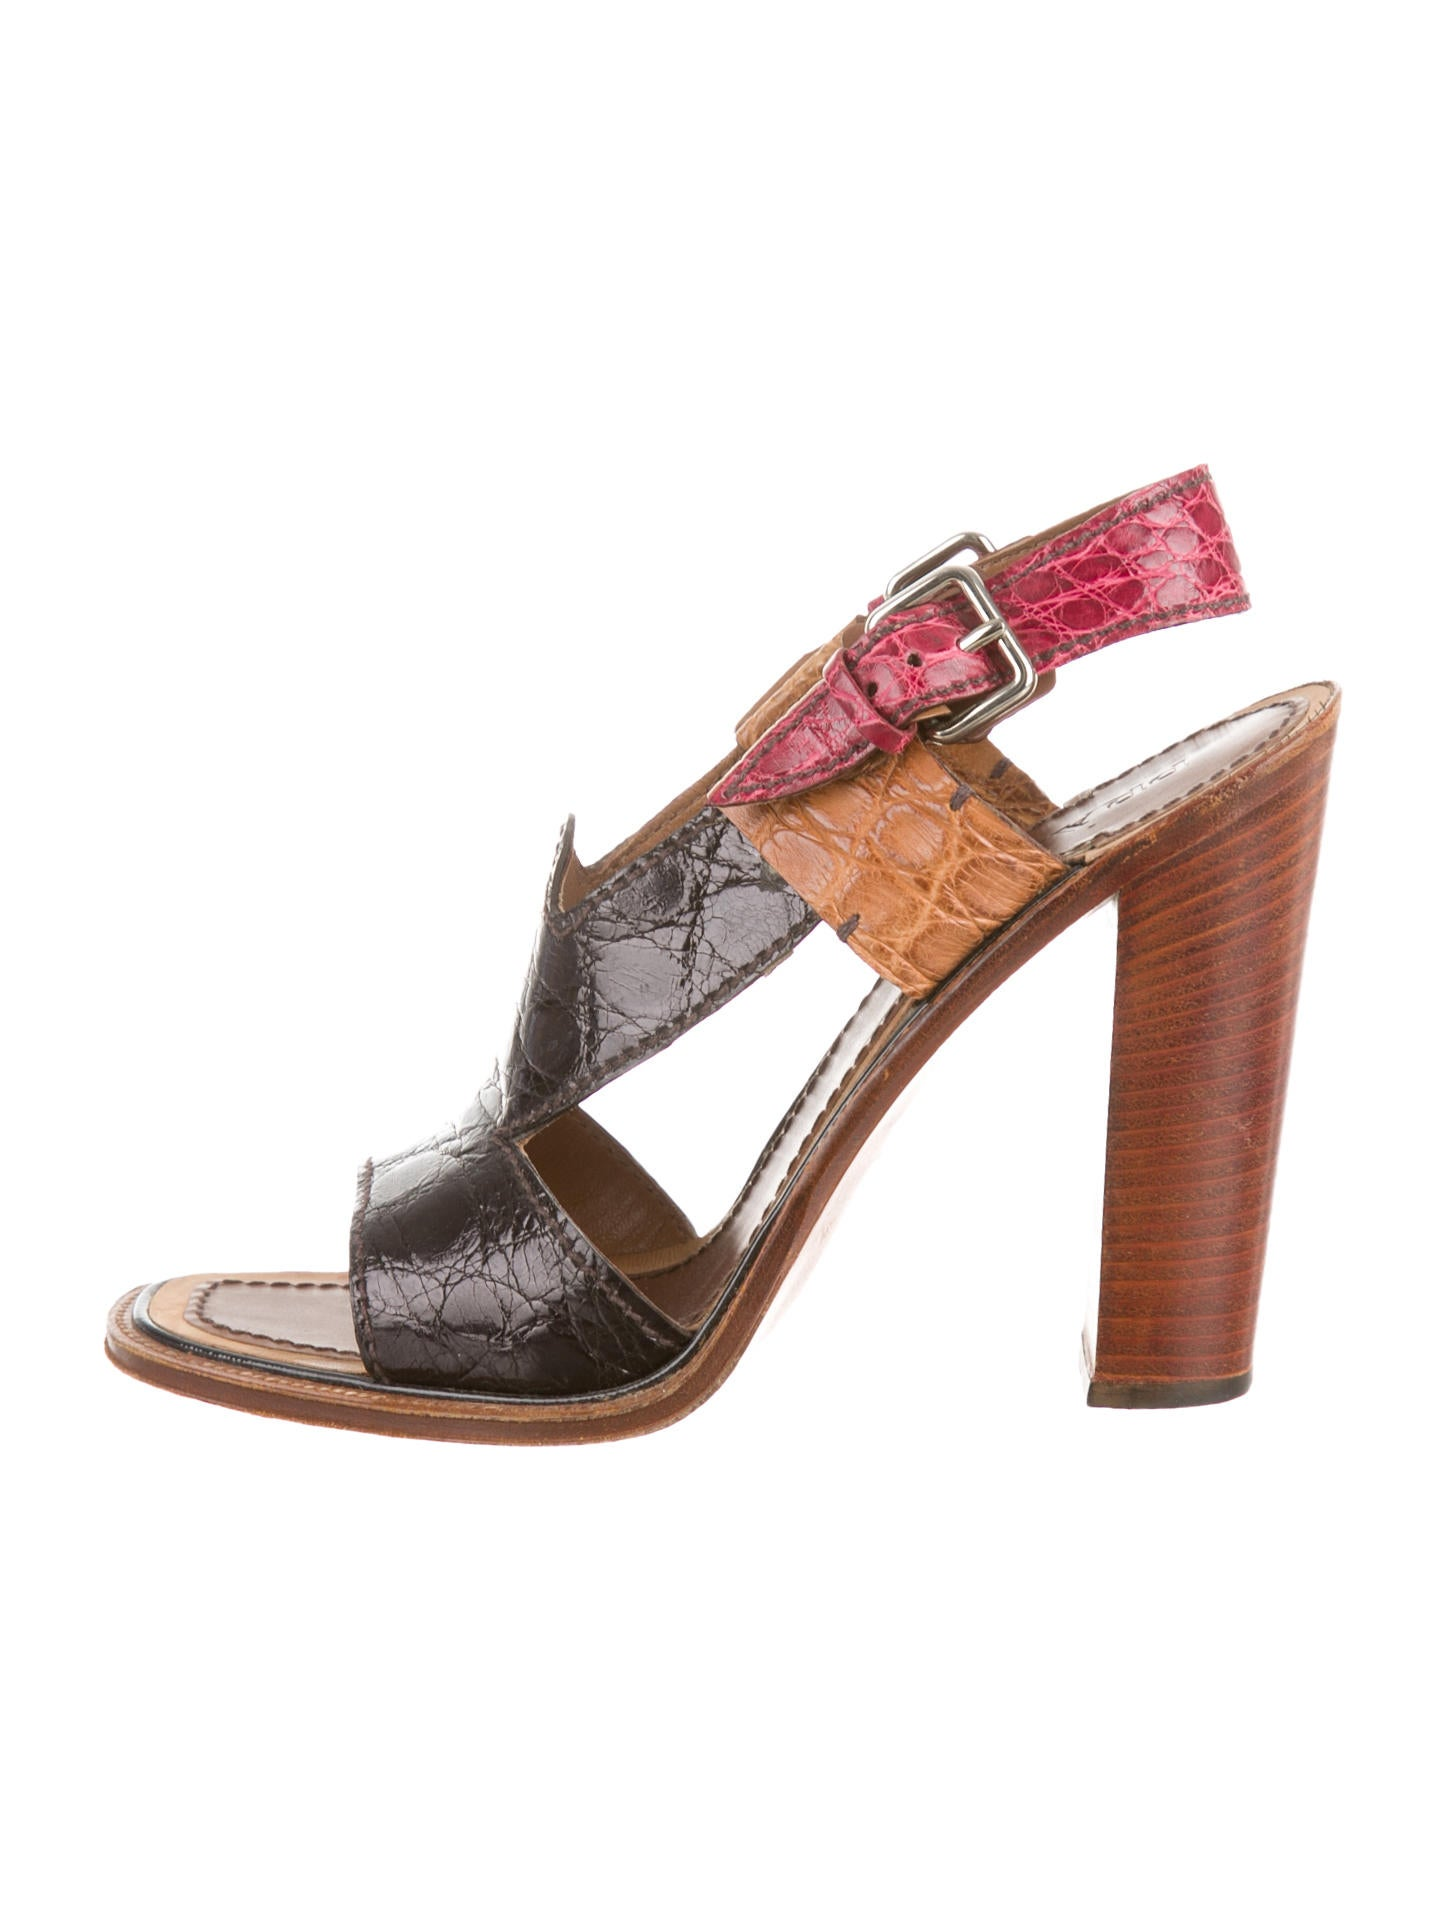 Amazing Prada Sandals  Shoes  PRA58358  The RealReal